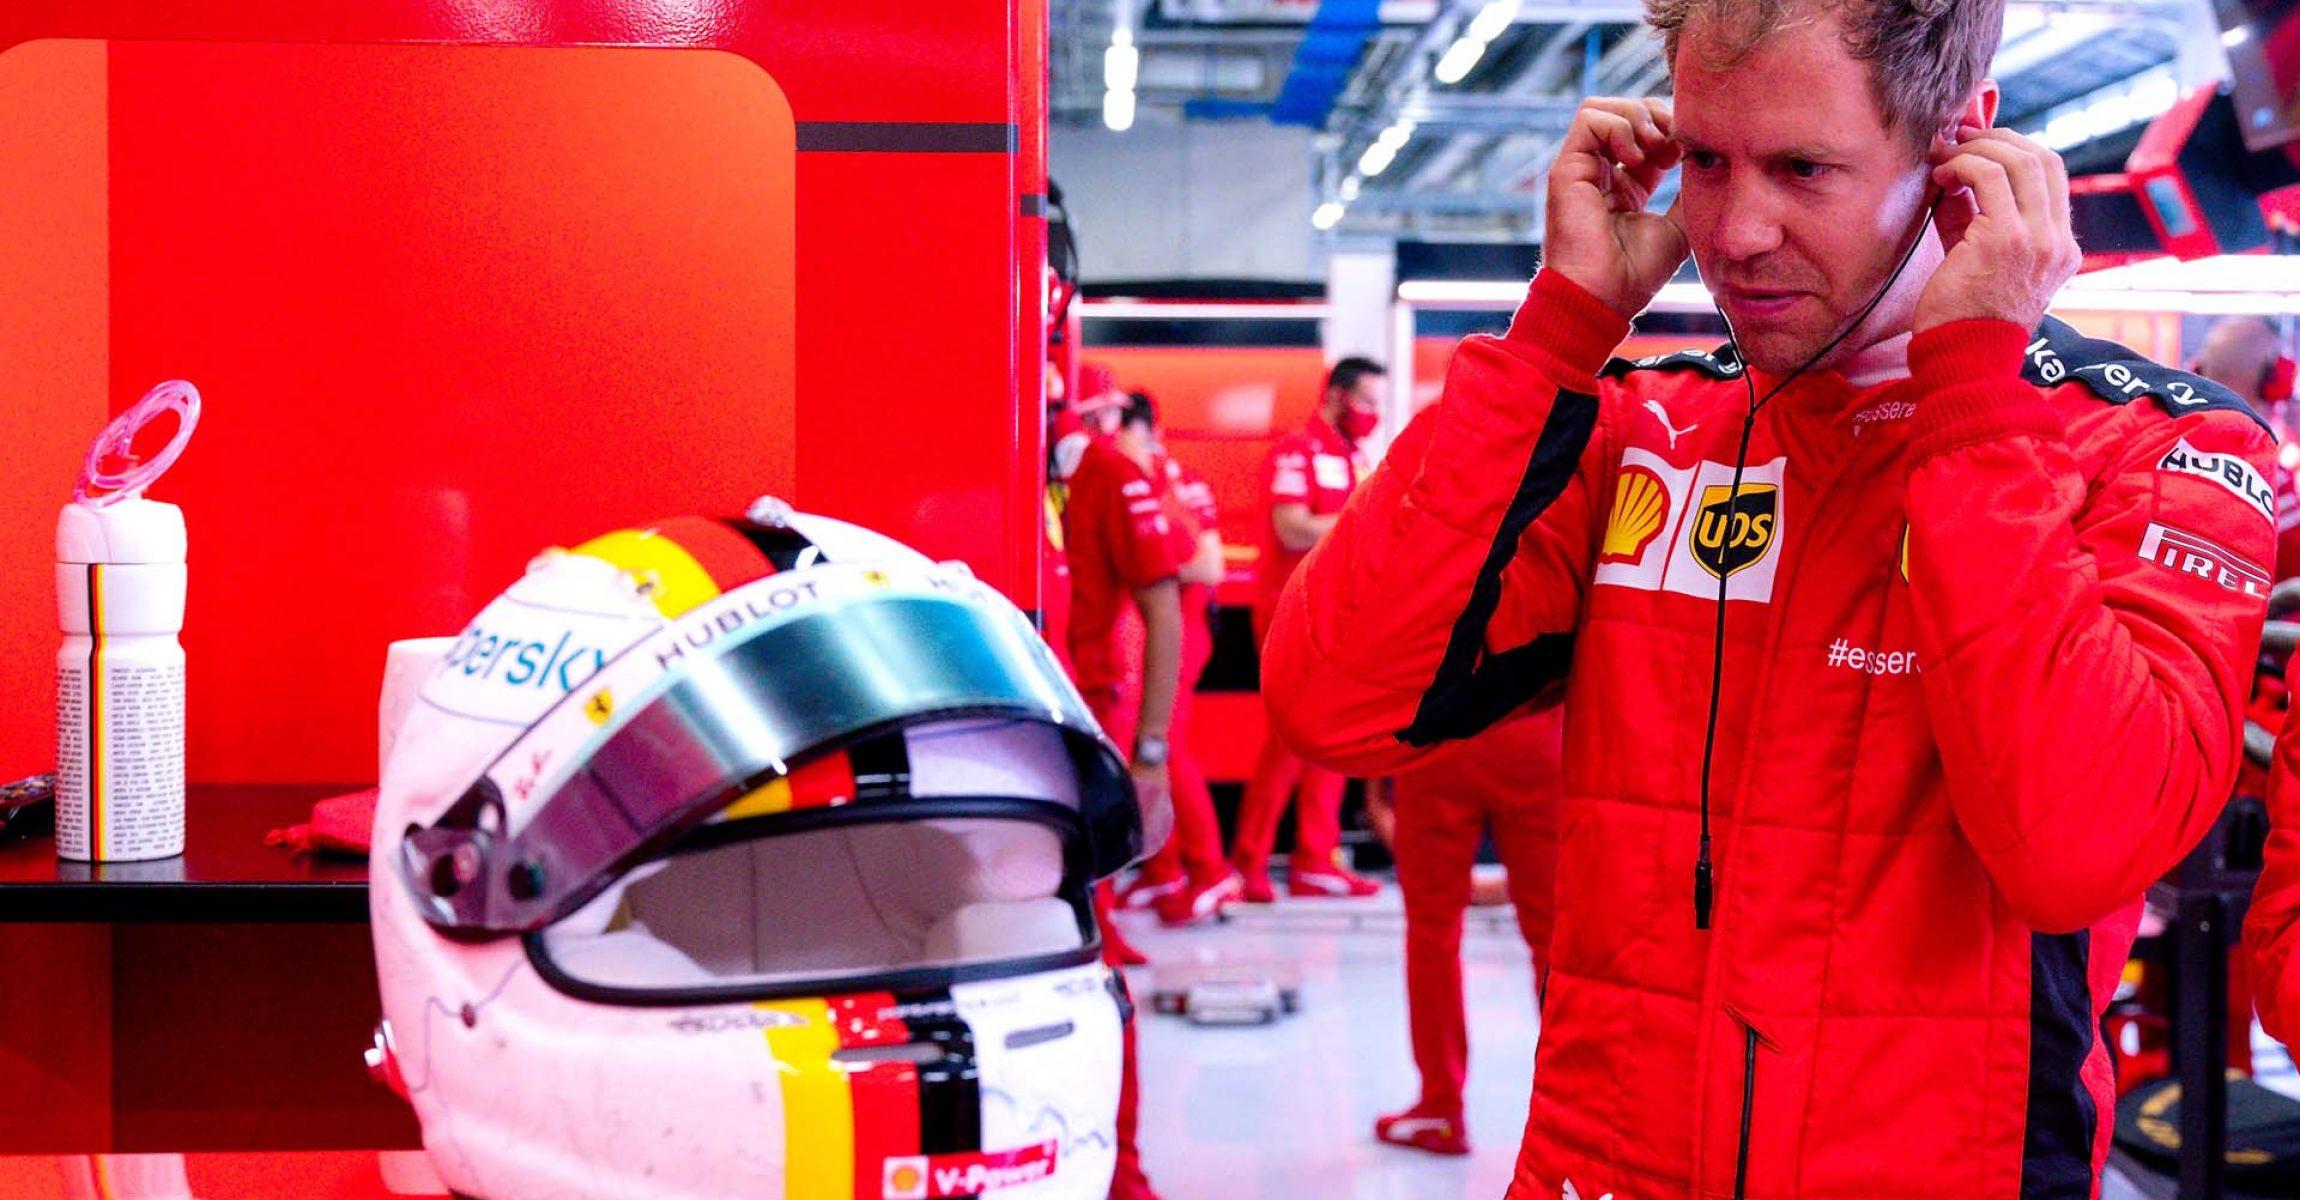 GP STYRIA F1/2020 - VENERDÌ 10/07/2020 credit: @Scuderia Ferrari Press Office Sebastian Vettel